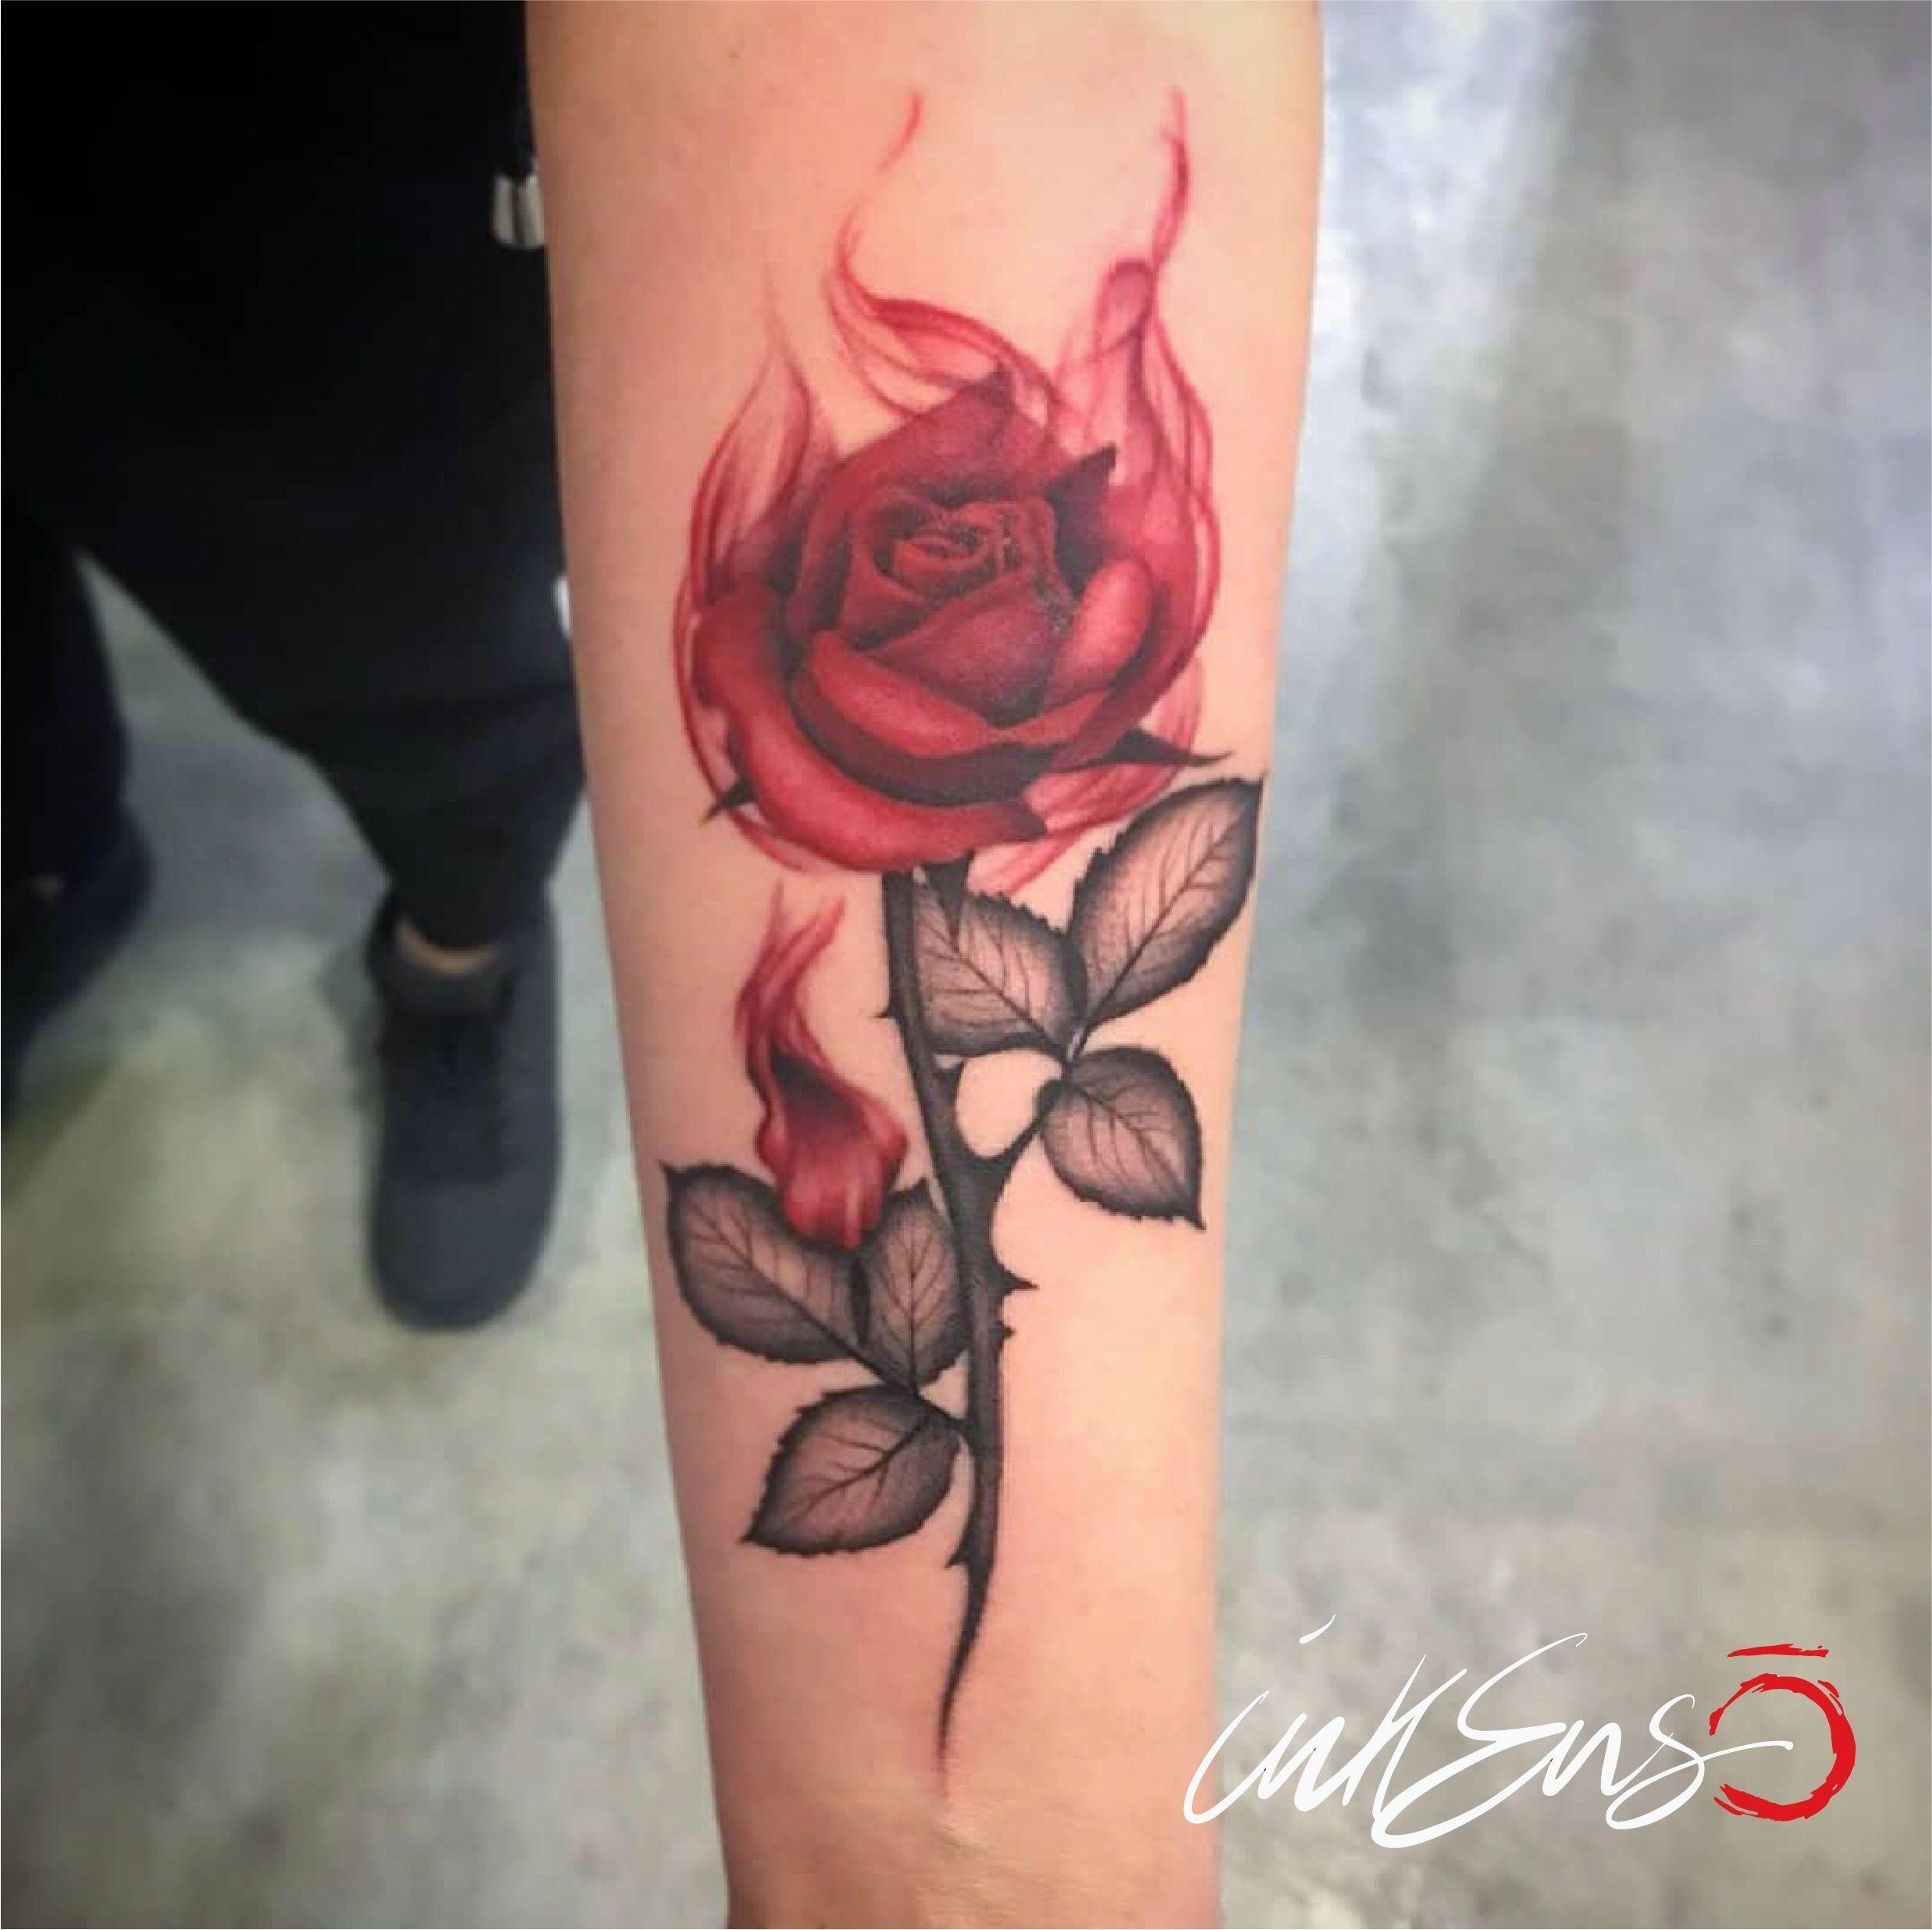 Follow Me On Instagram Ilainktattoo Inkensotattoostudio 1st Prize At Piacenza Tattoo Hand Tattoos Flame Tattoos Tattoos